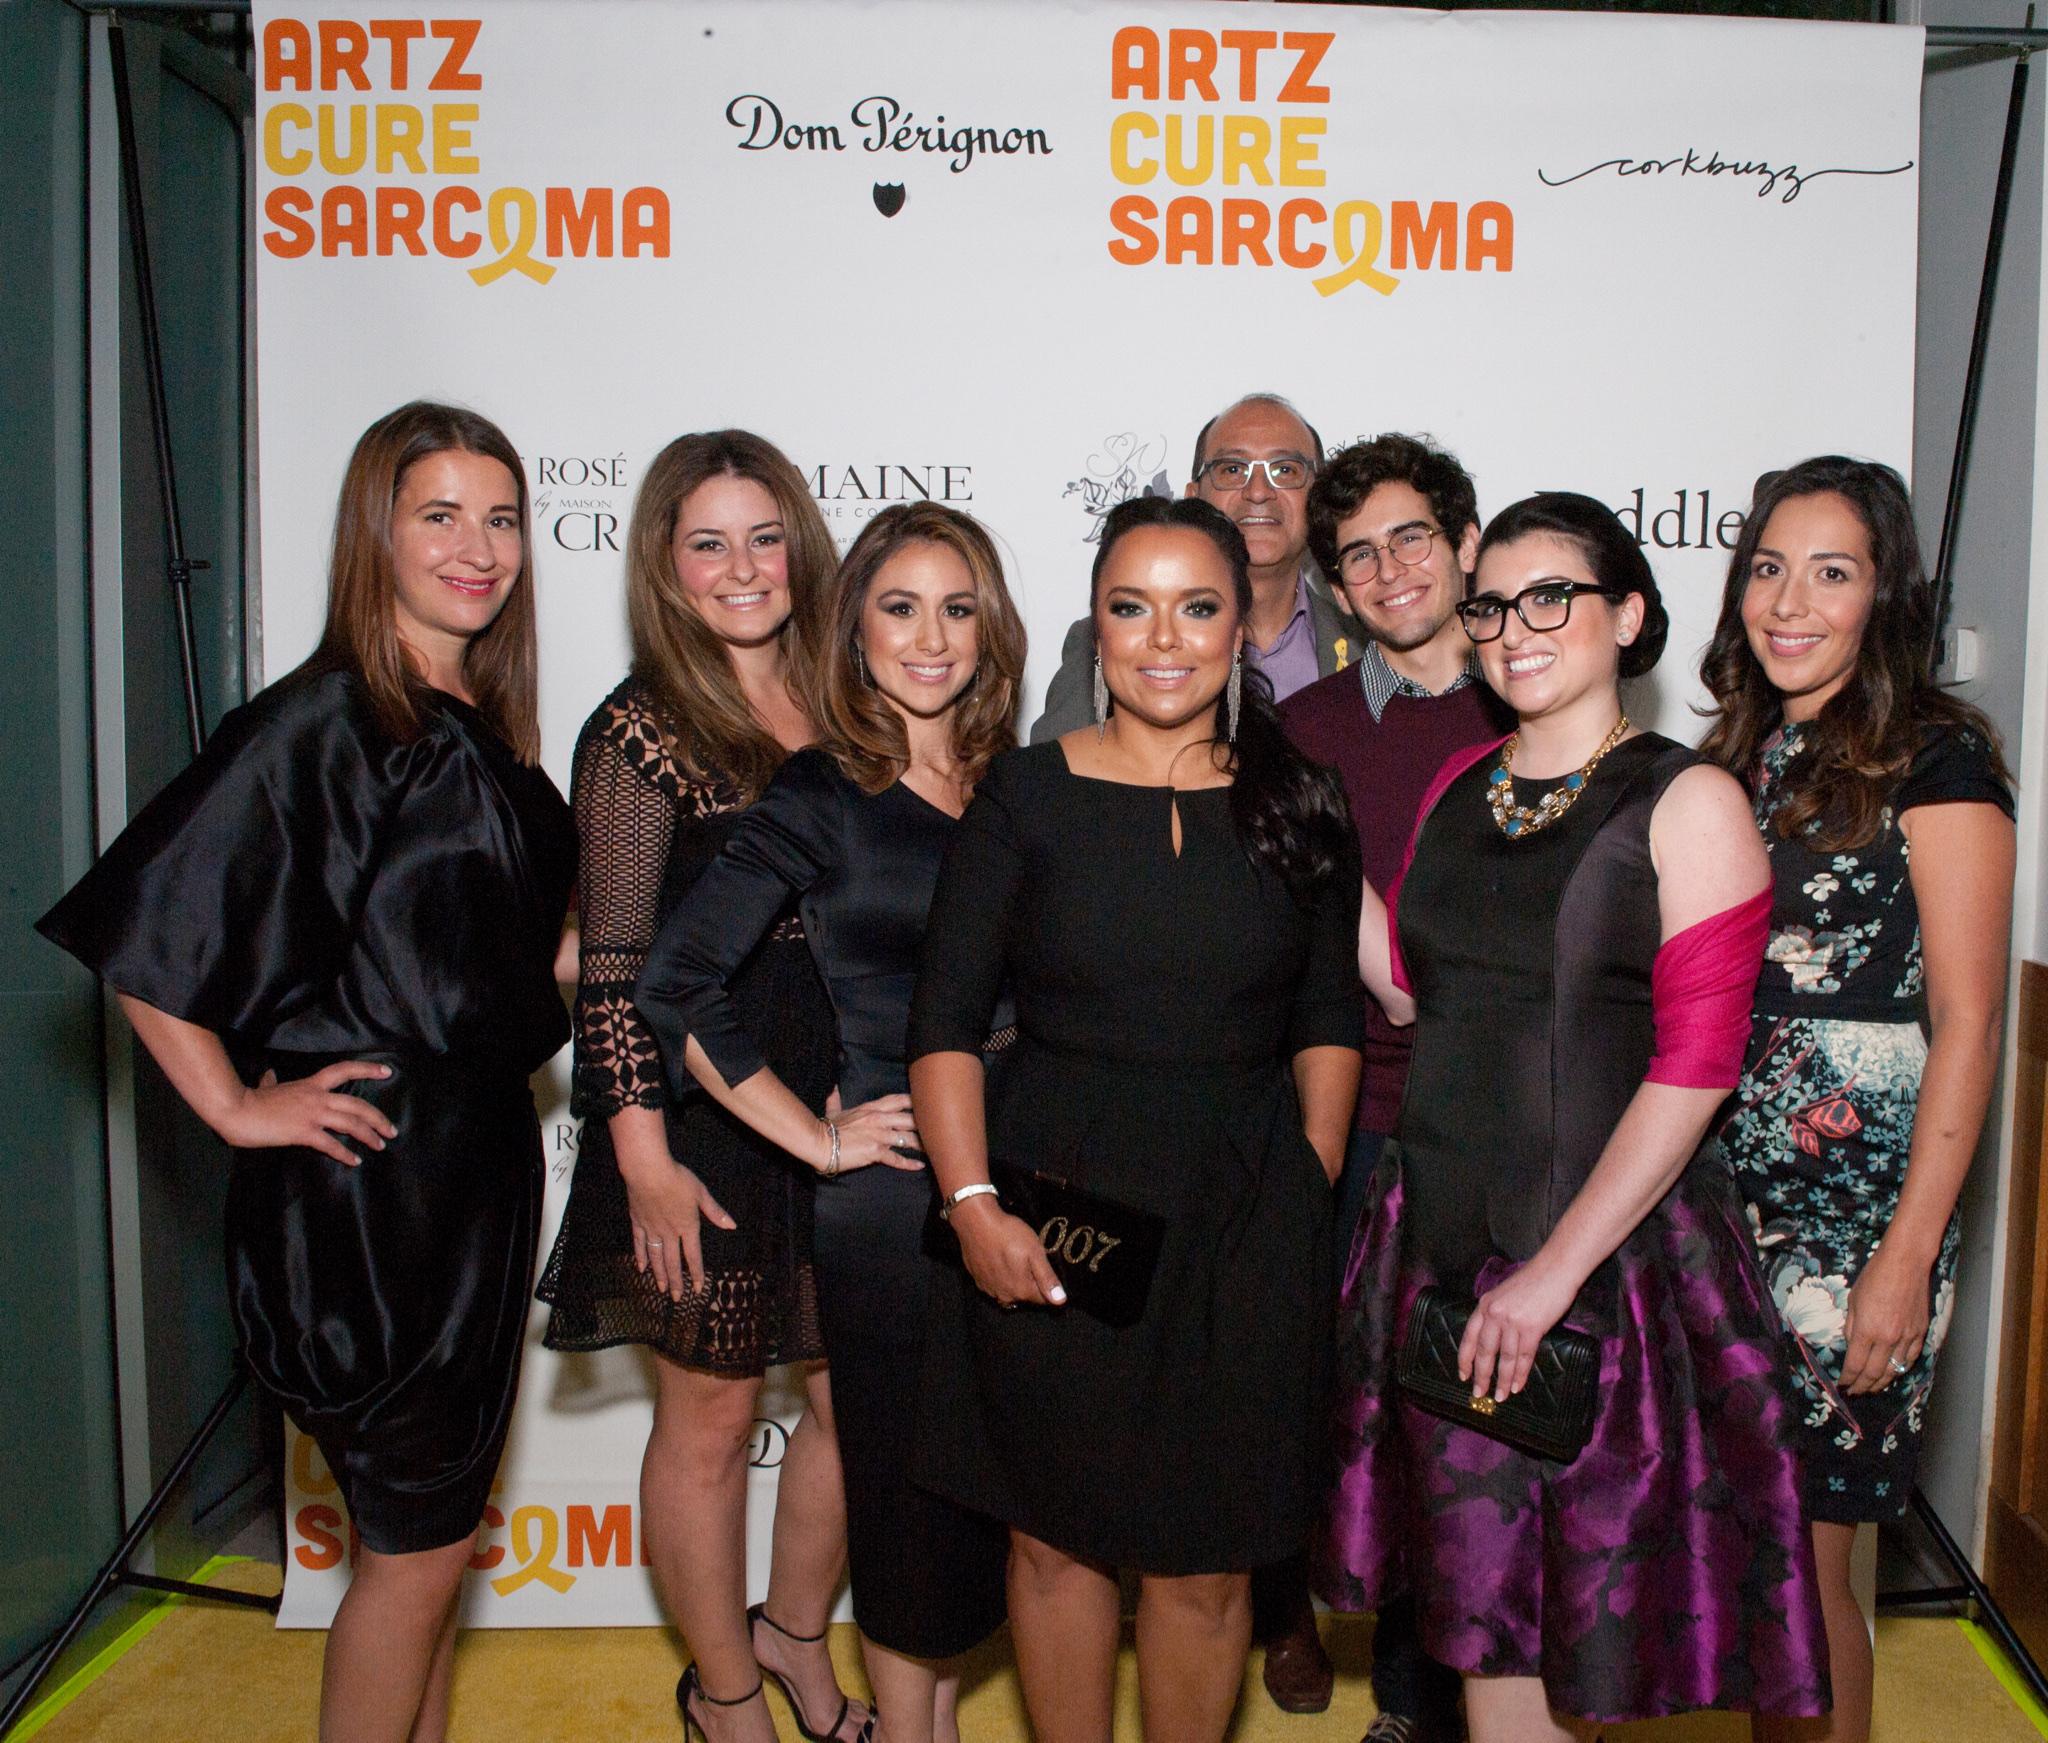 Artz Cure Sarcoma Event 9-2016-57.jpg